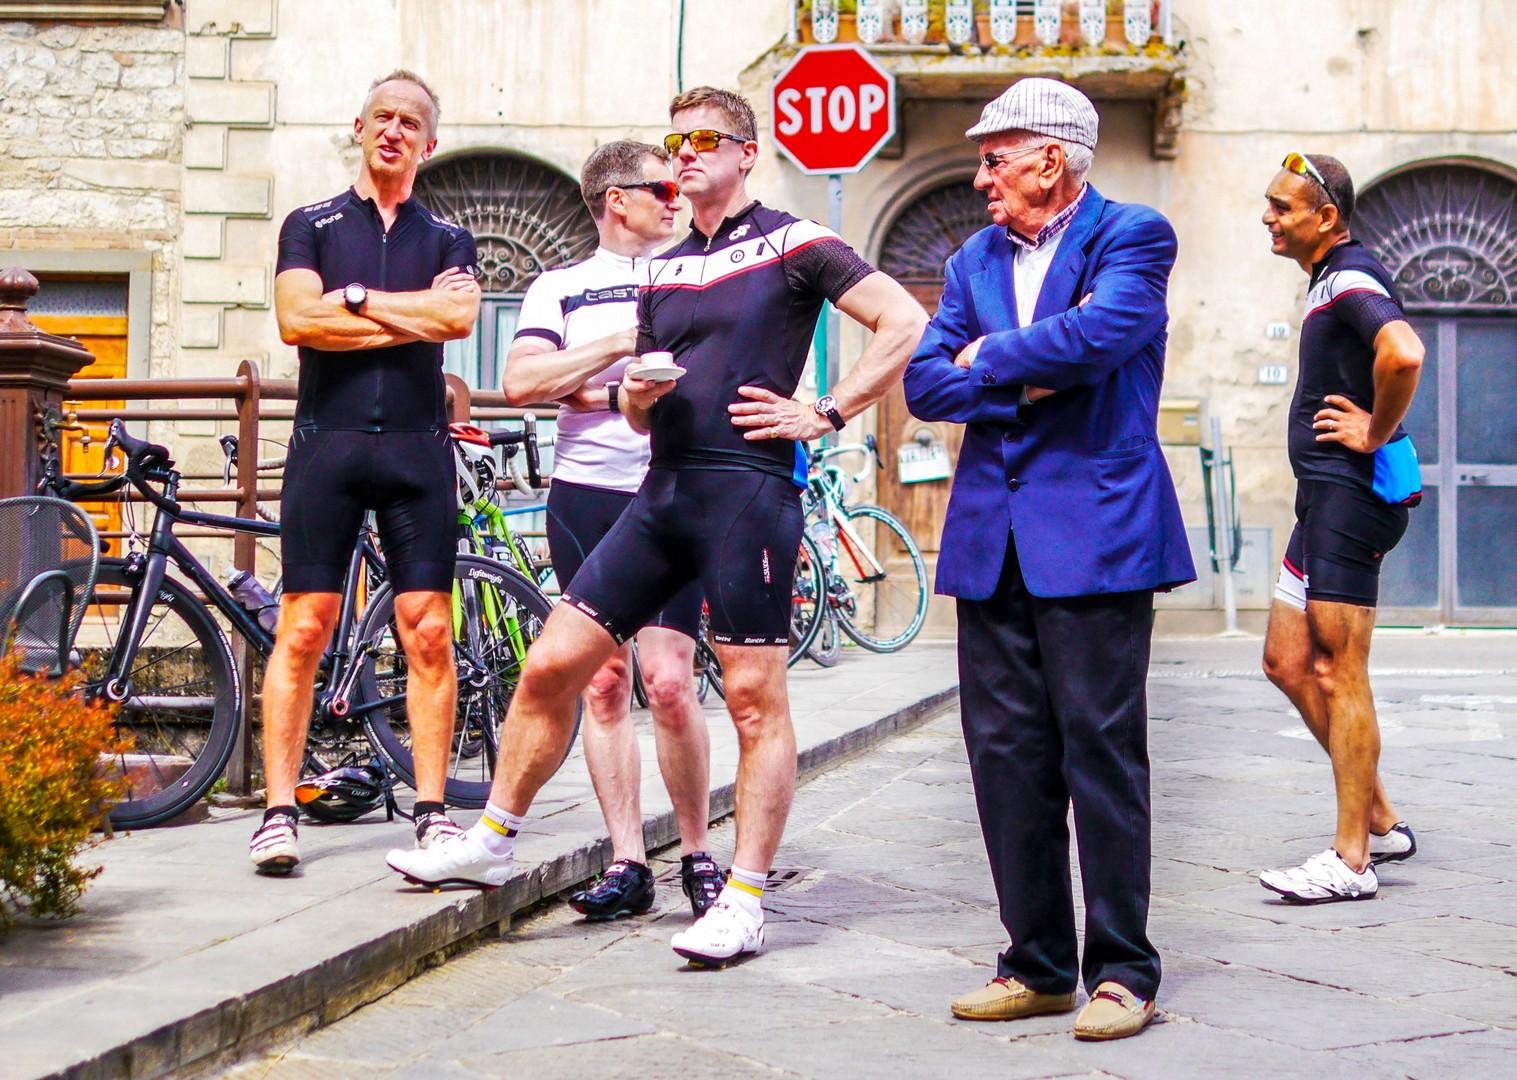 New member of the team.jpg - Italy - Tuscany - Giro della Toscana - Guided Road Cycling Holiday - Road Cycling